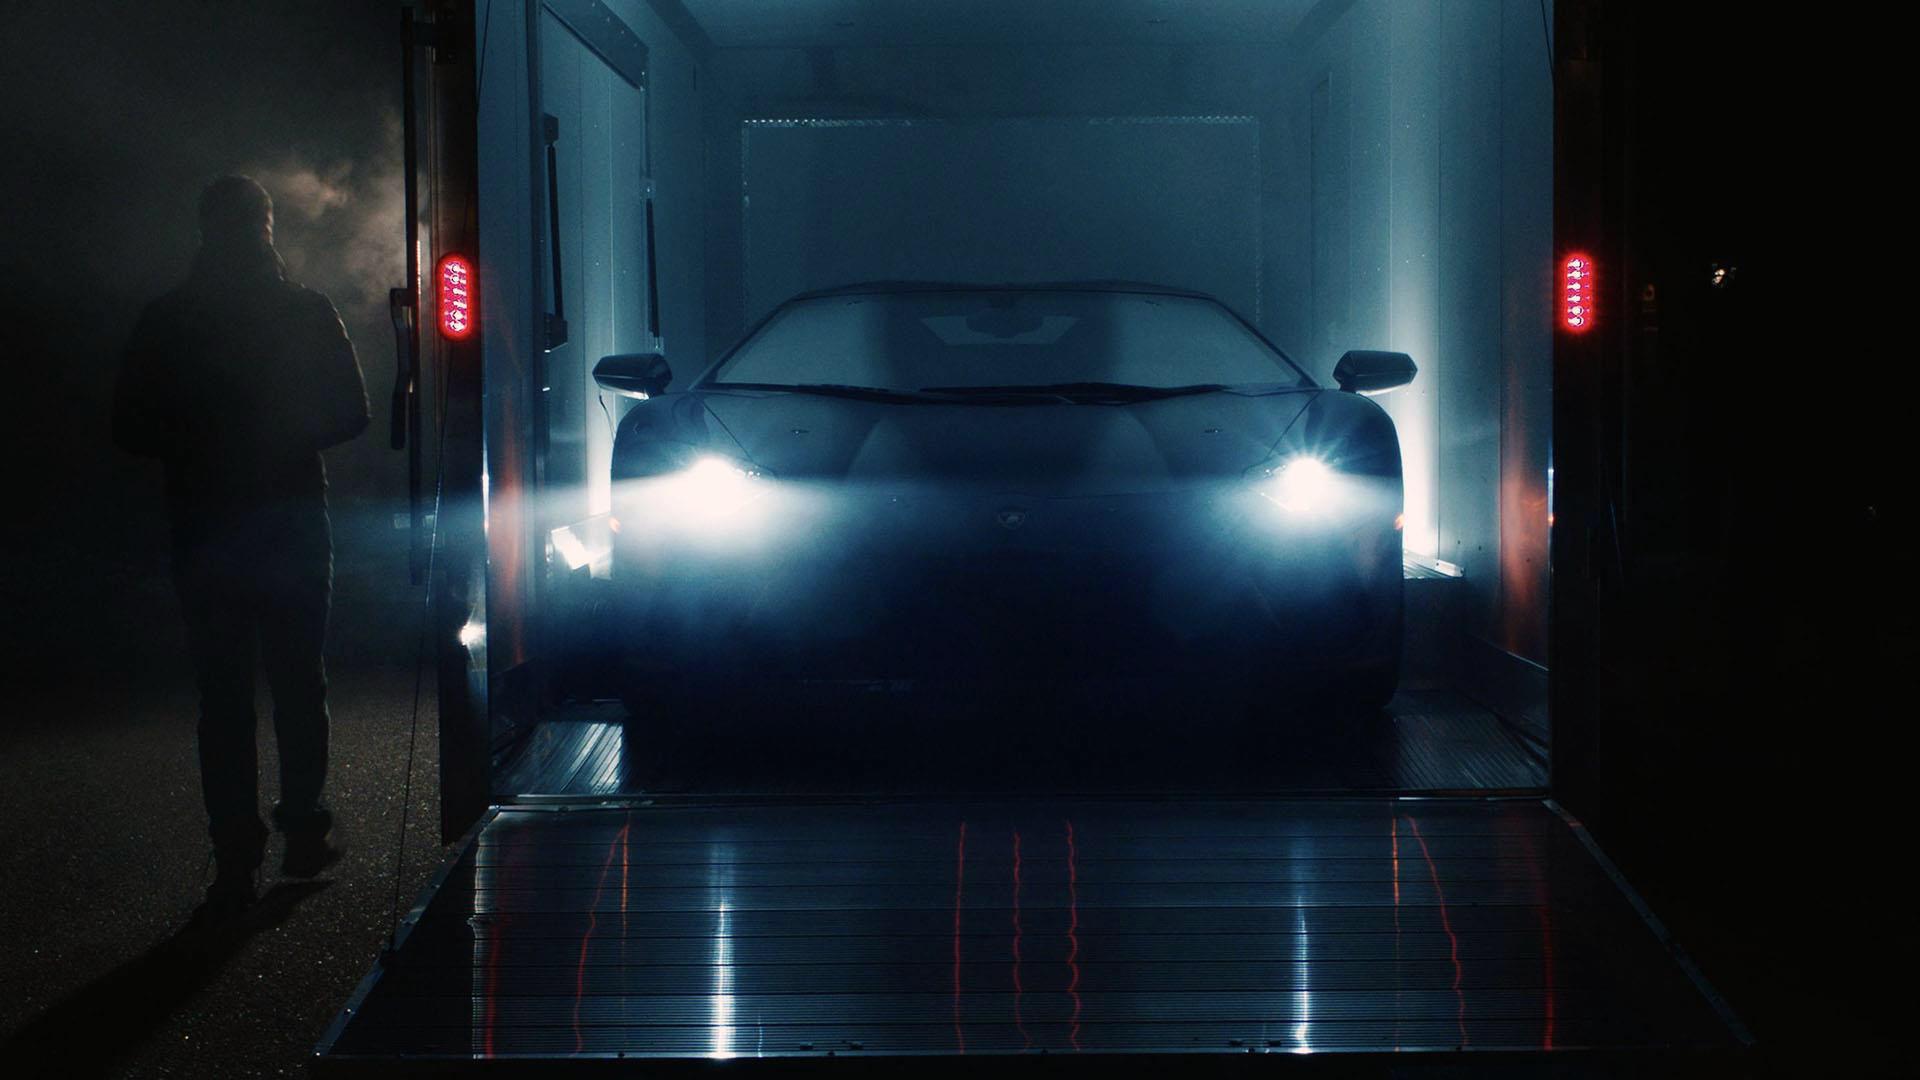 3D Printed Lamborghini Aventador Christmas Gift